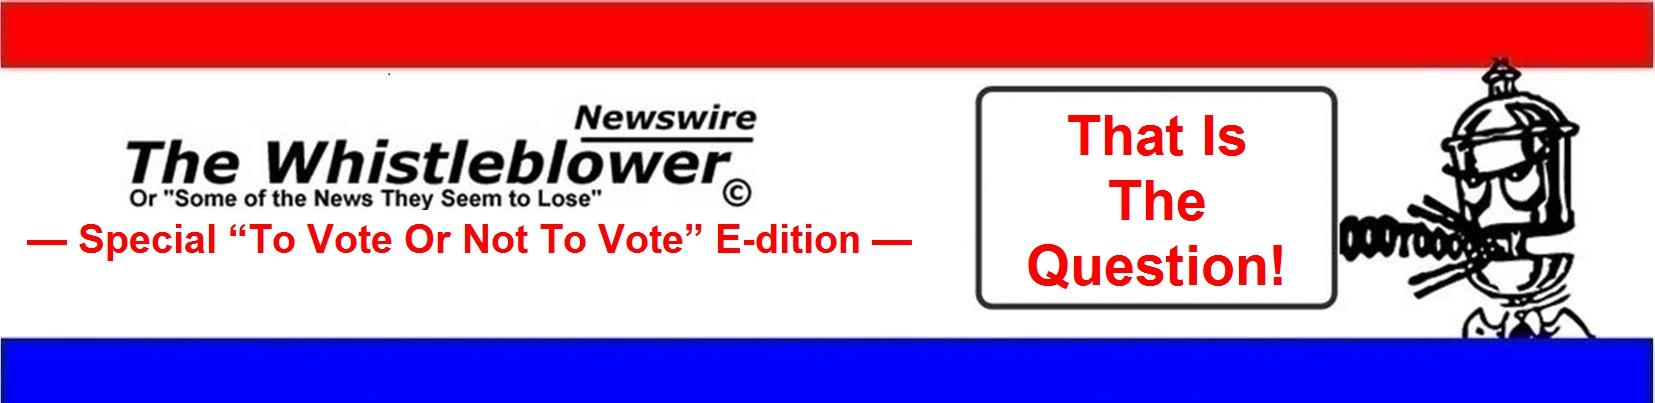 HEADER-NOV 3 TO VOTE